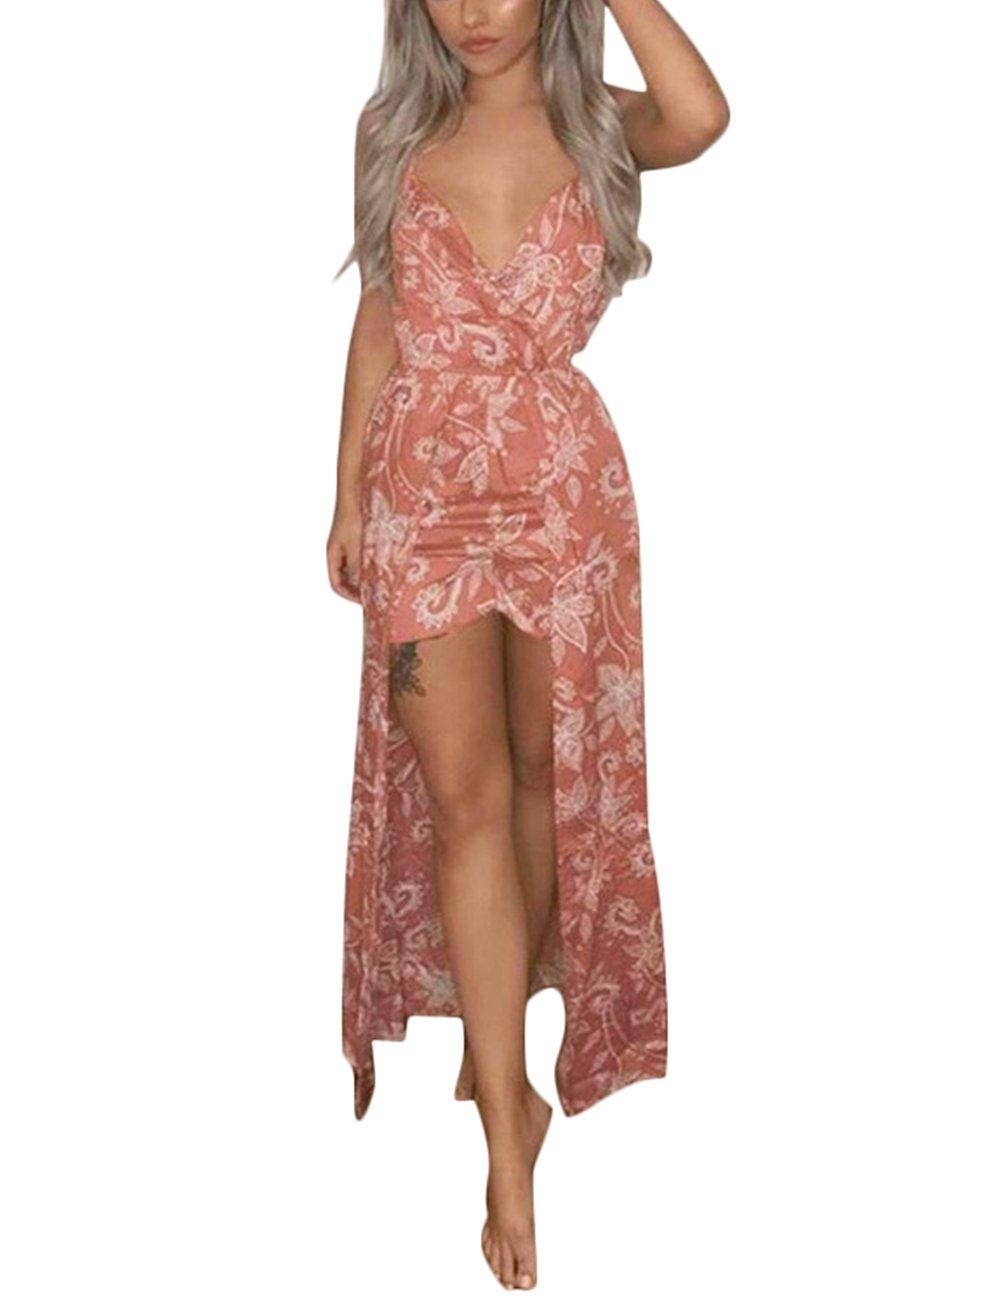 Kbook Womens Sleeveless V-Neck Floral Print Split Beach Party Maxi Romper Jumpsuit Dress